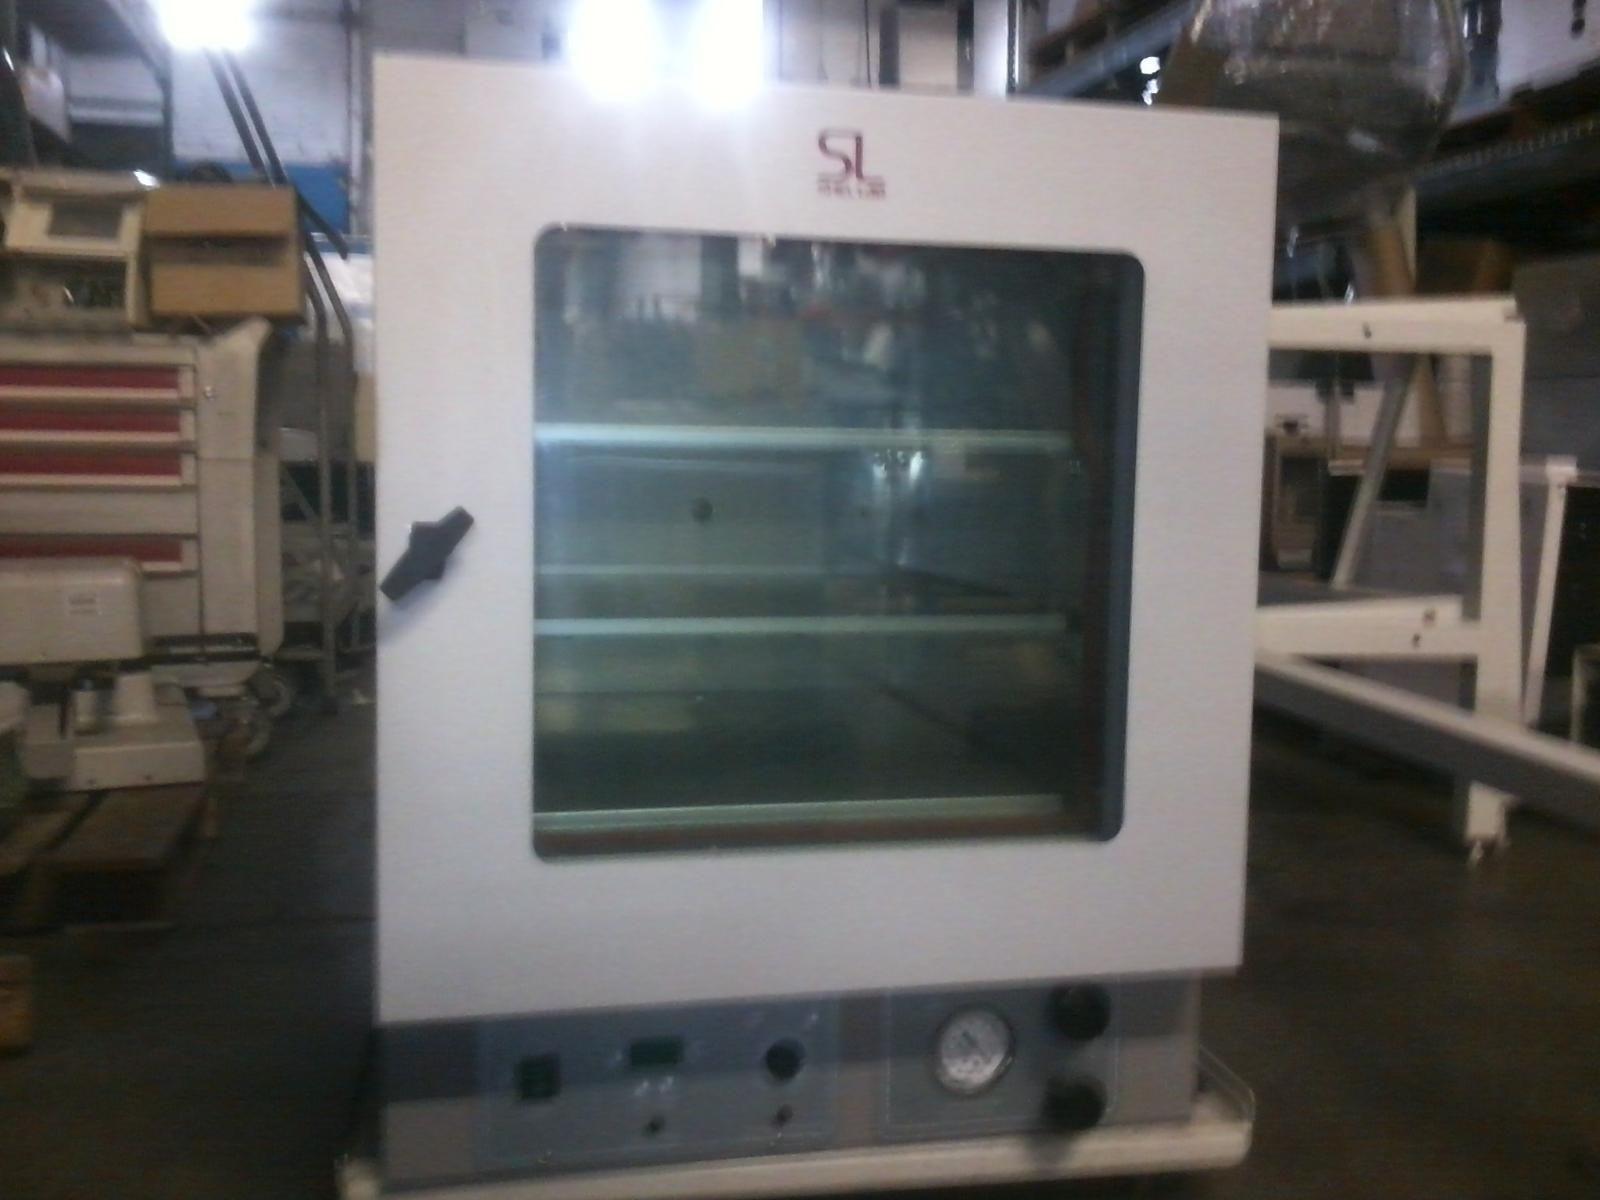 Shel Lab / Sheldon Laboratory 1465  Digital Vacuum Oven, 120 Volts, 4.5 cubic ft capacity